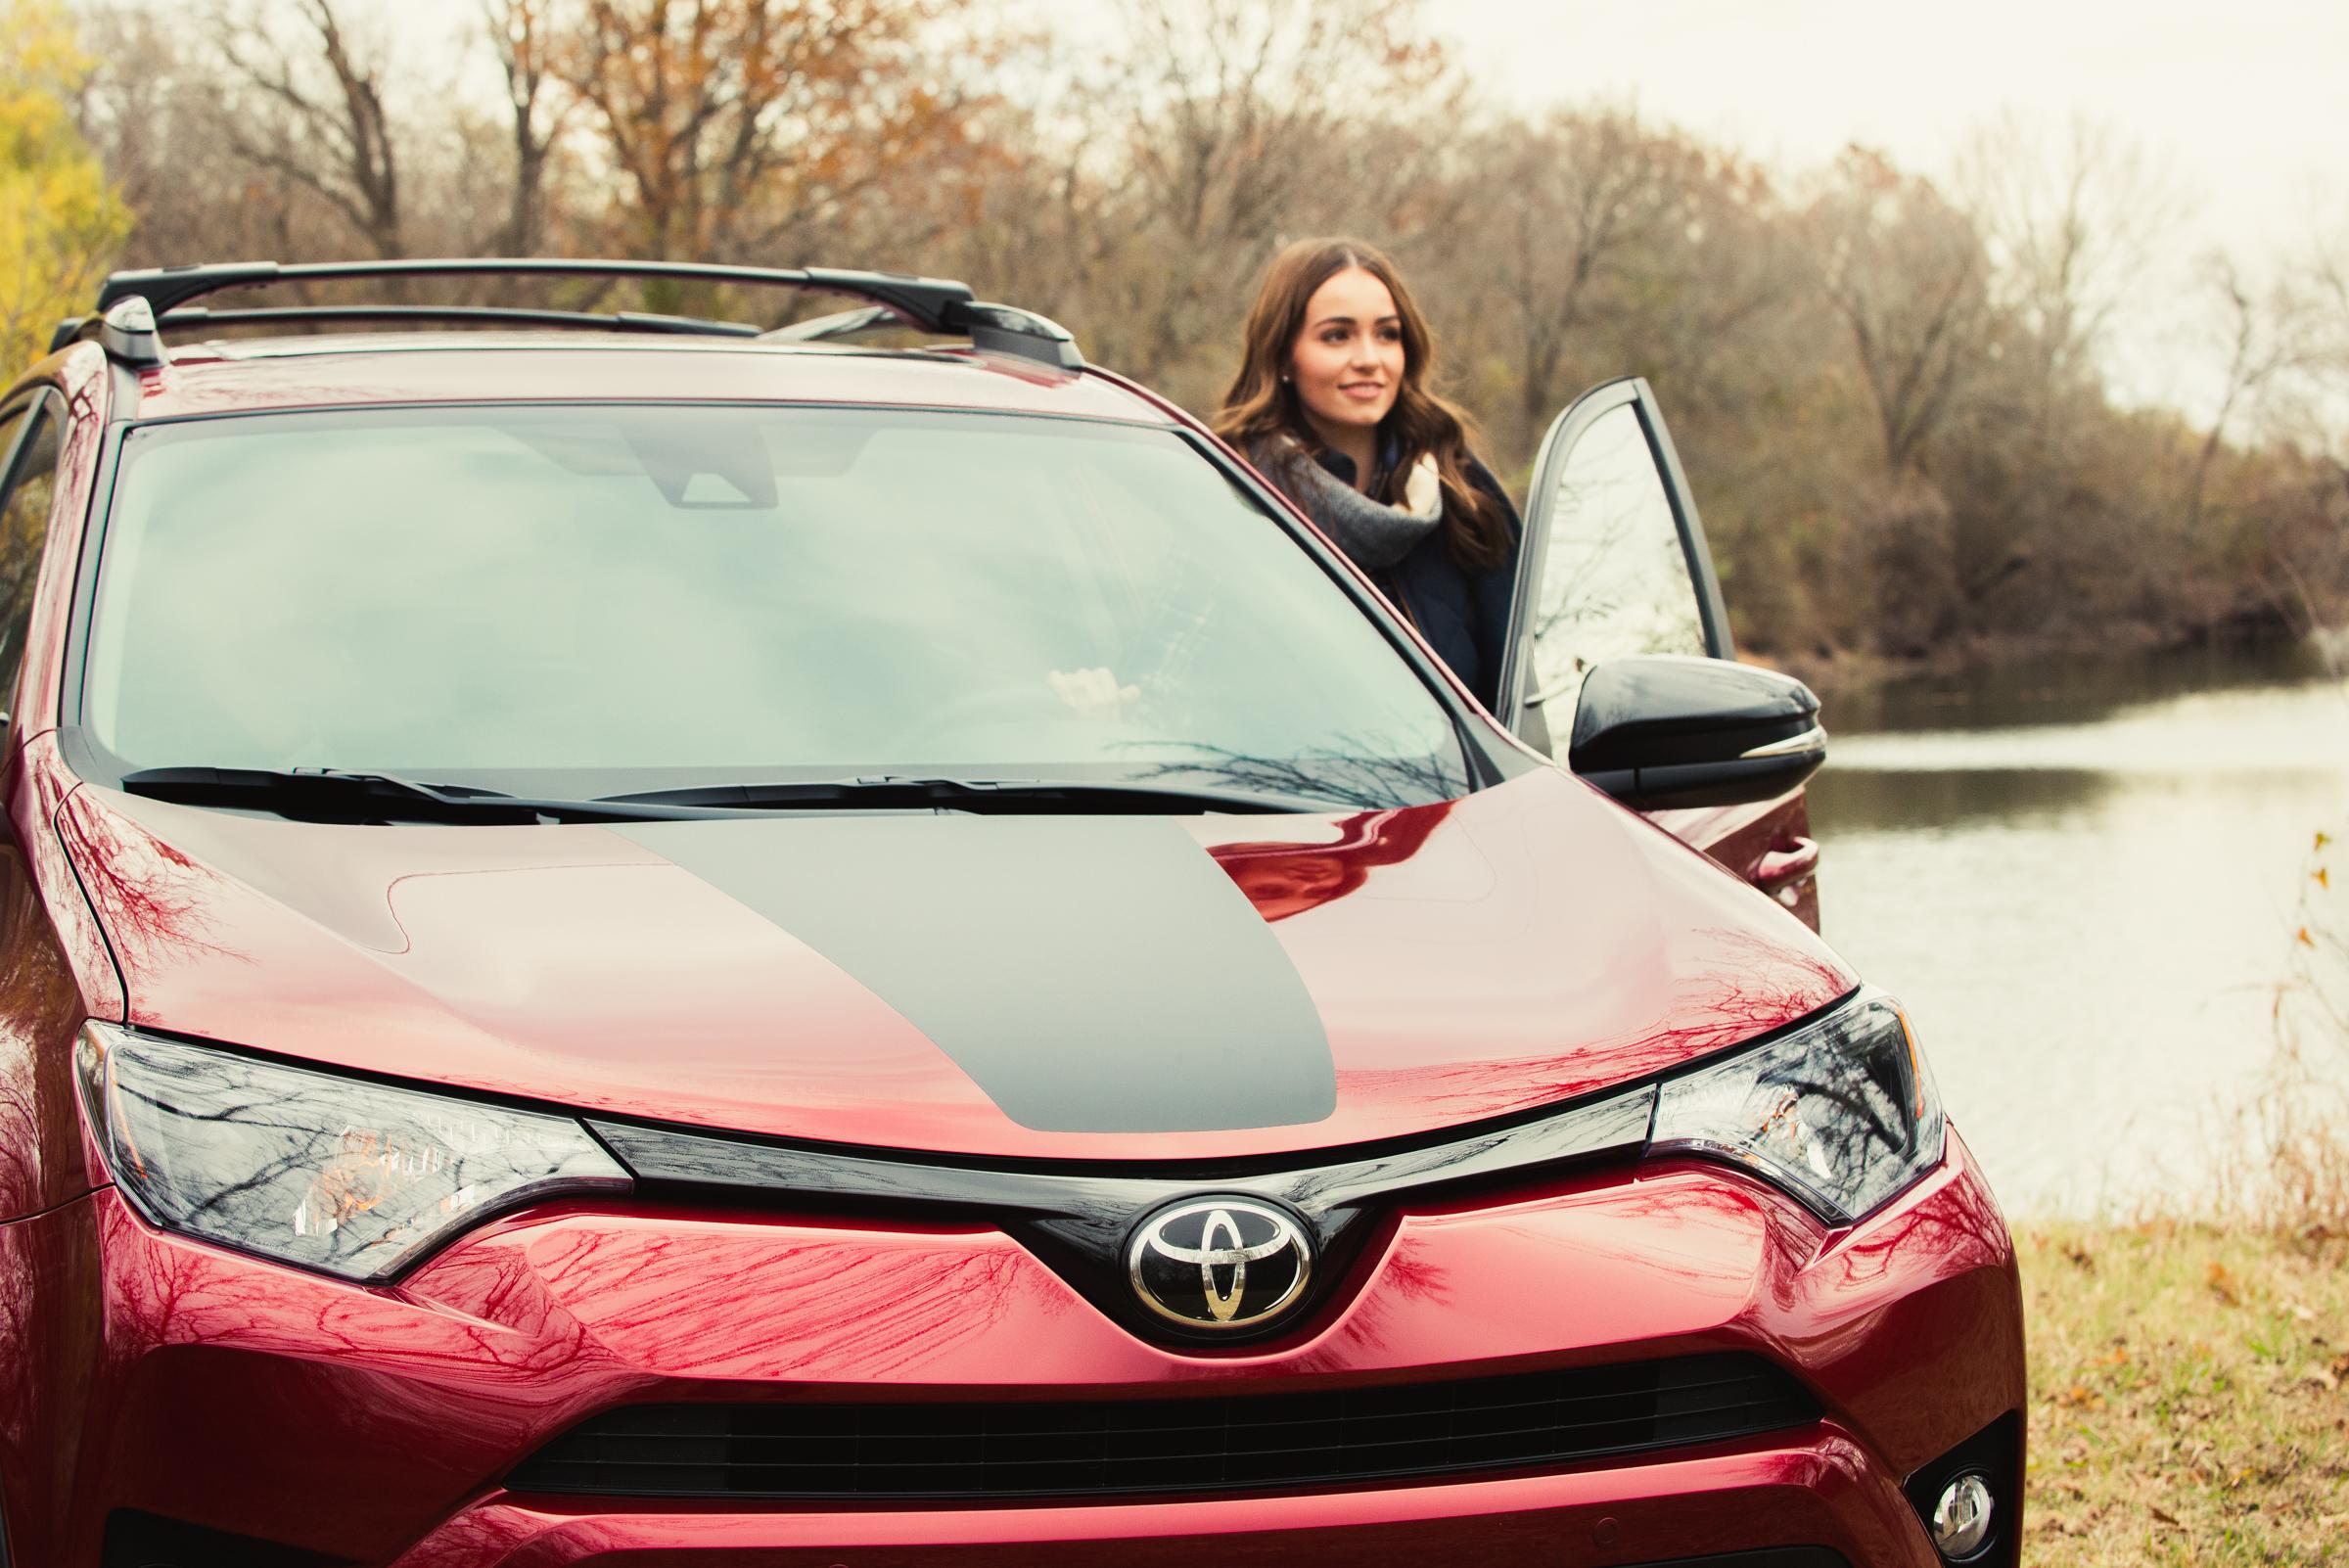 Toyota Texas Photo Shoot - Automotive Photographer Los Angeles